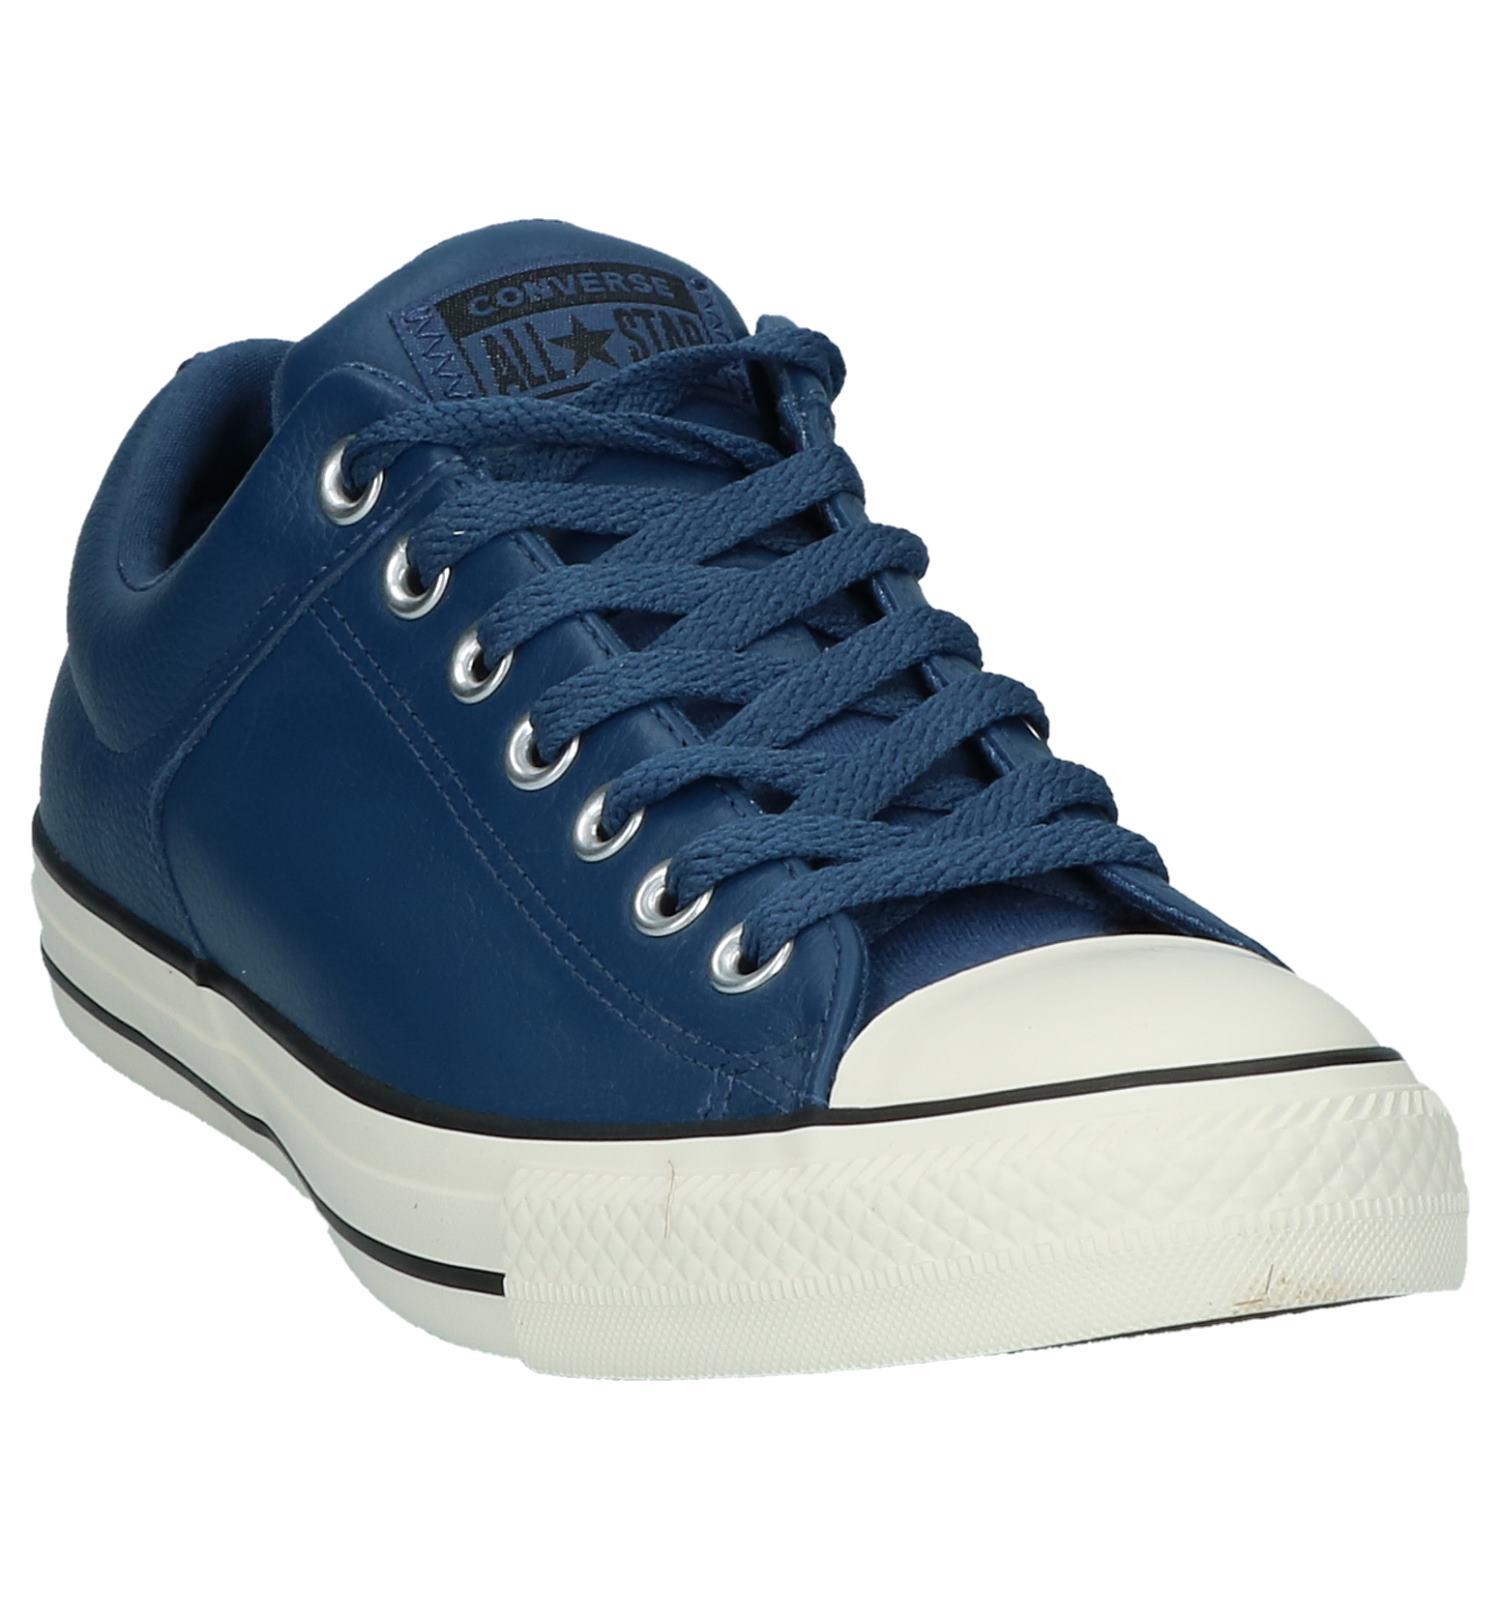 Sneakers All Street Star Blauwe Ox Chuck Converse High Taylor l31KcTFJ